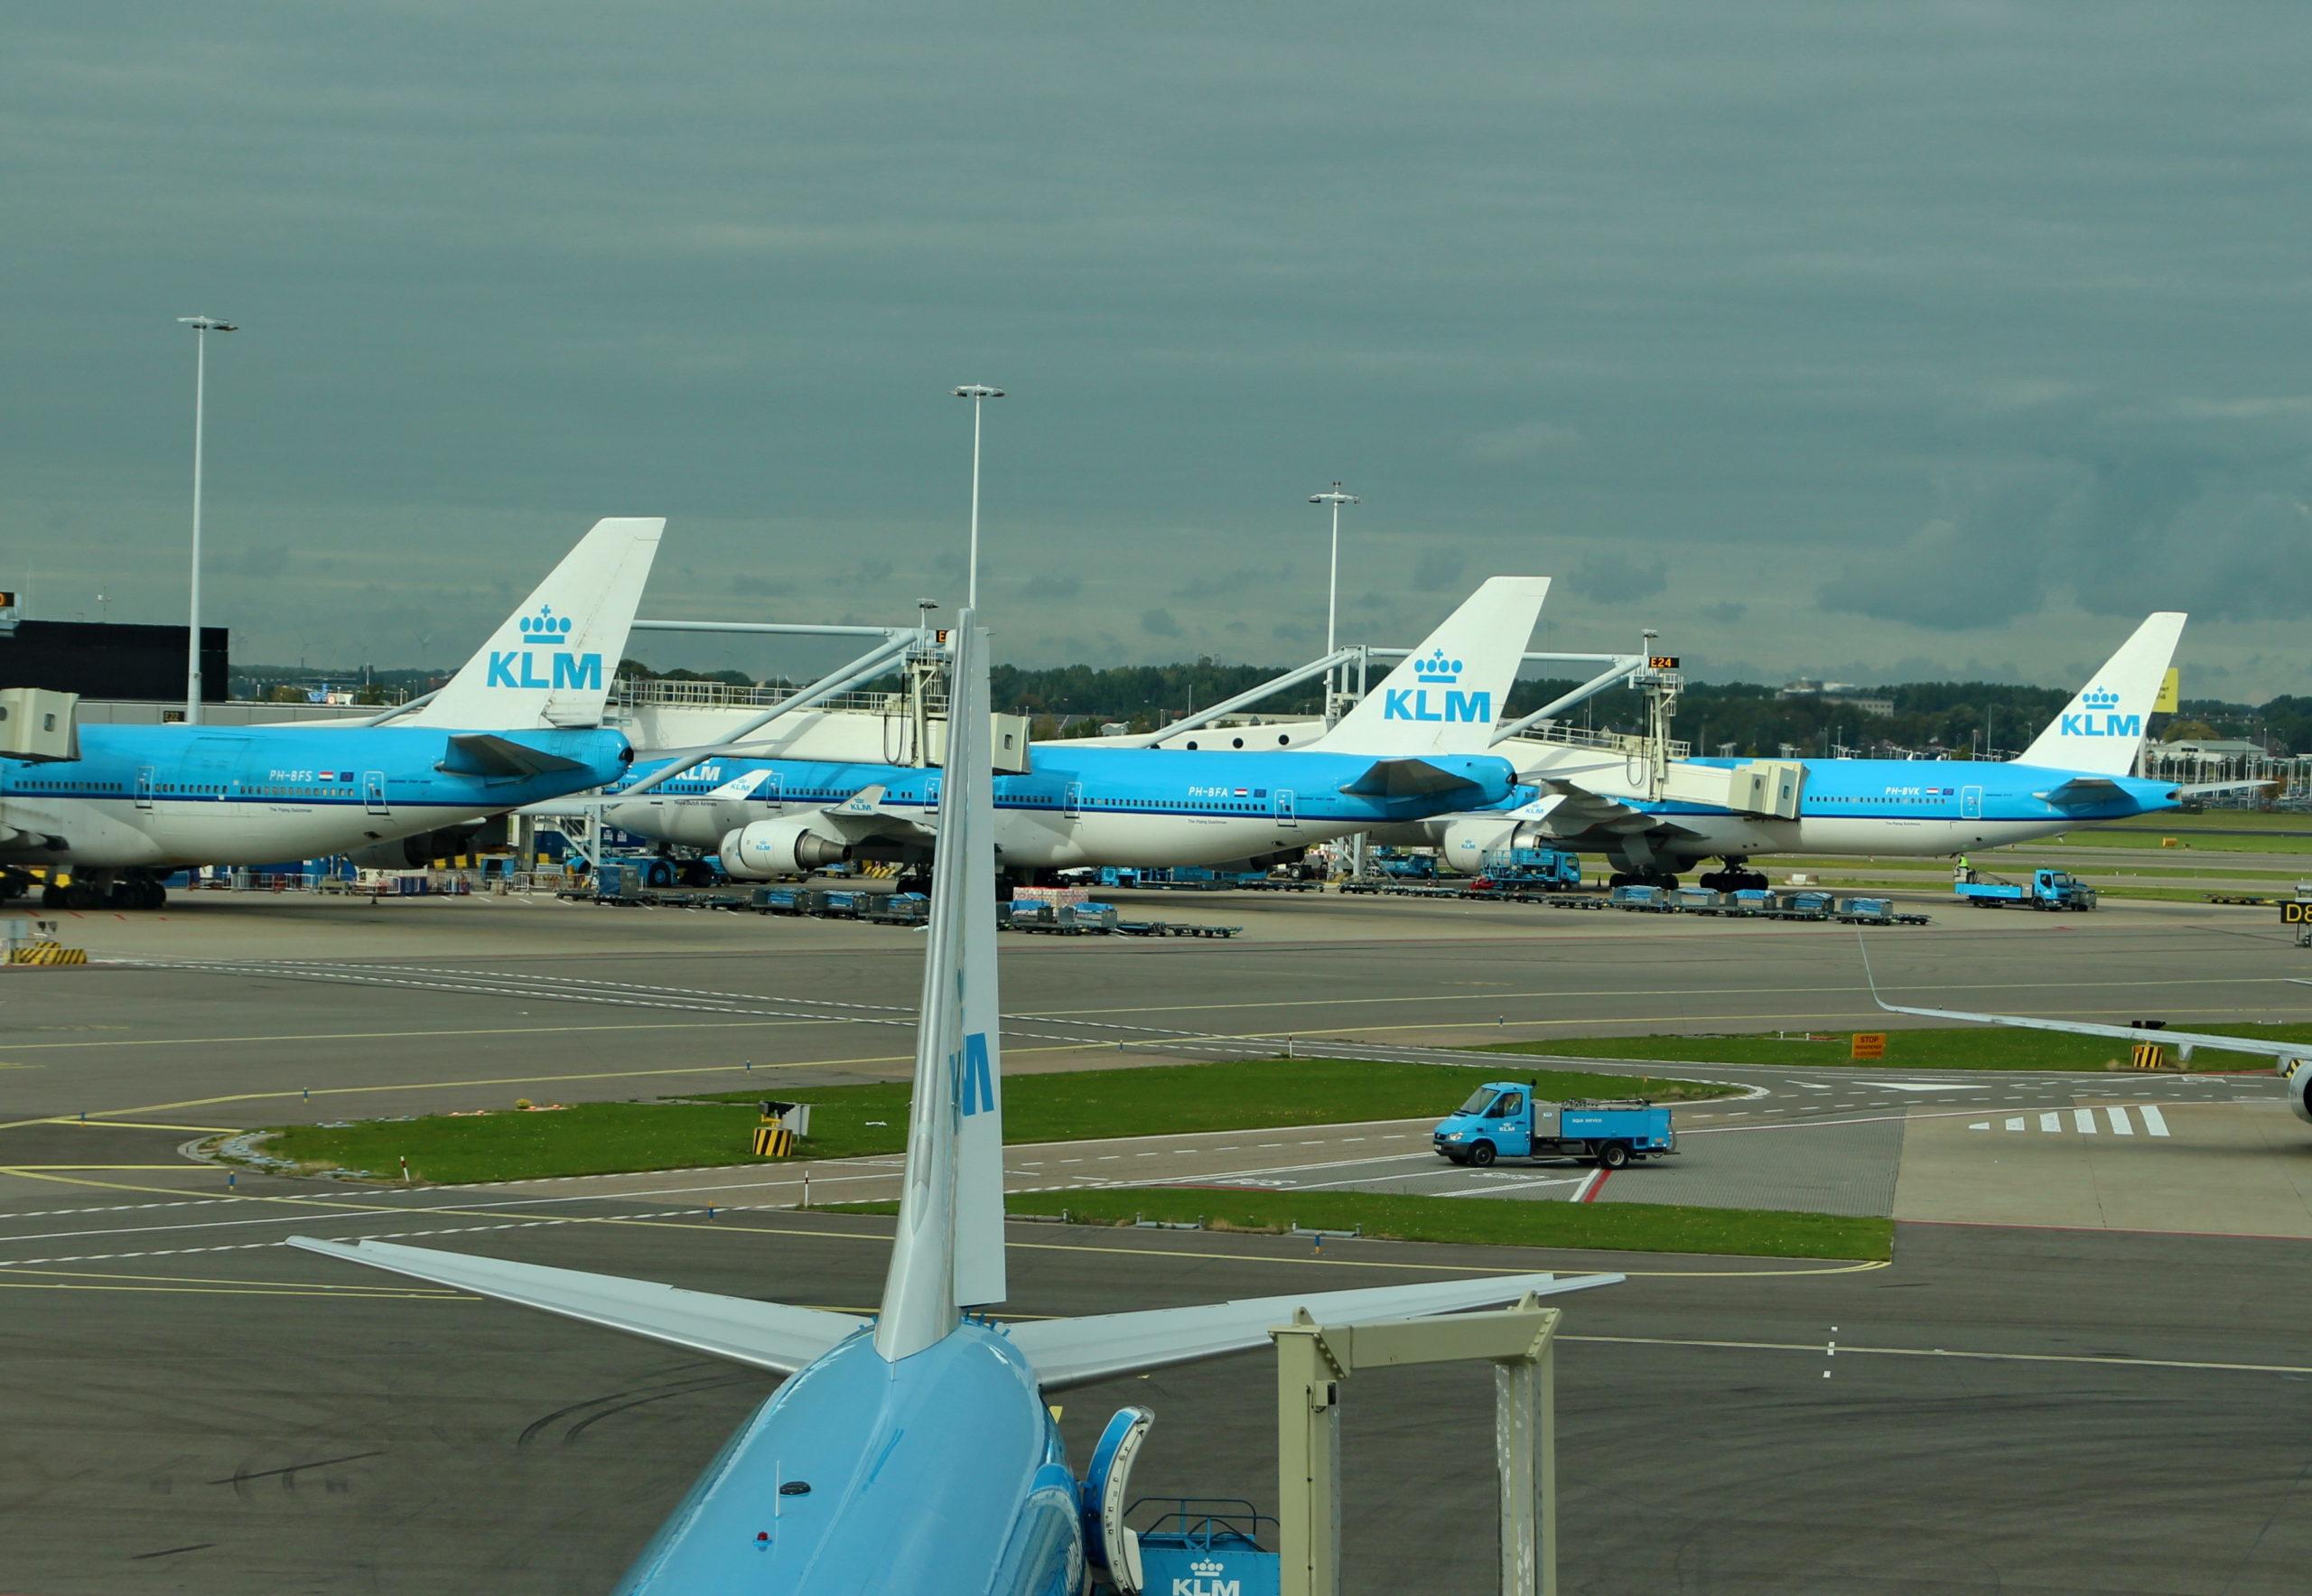 KLM-scaled.jpg